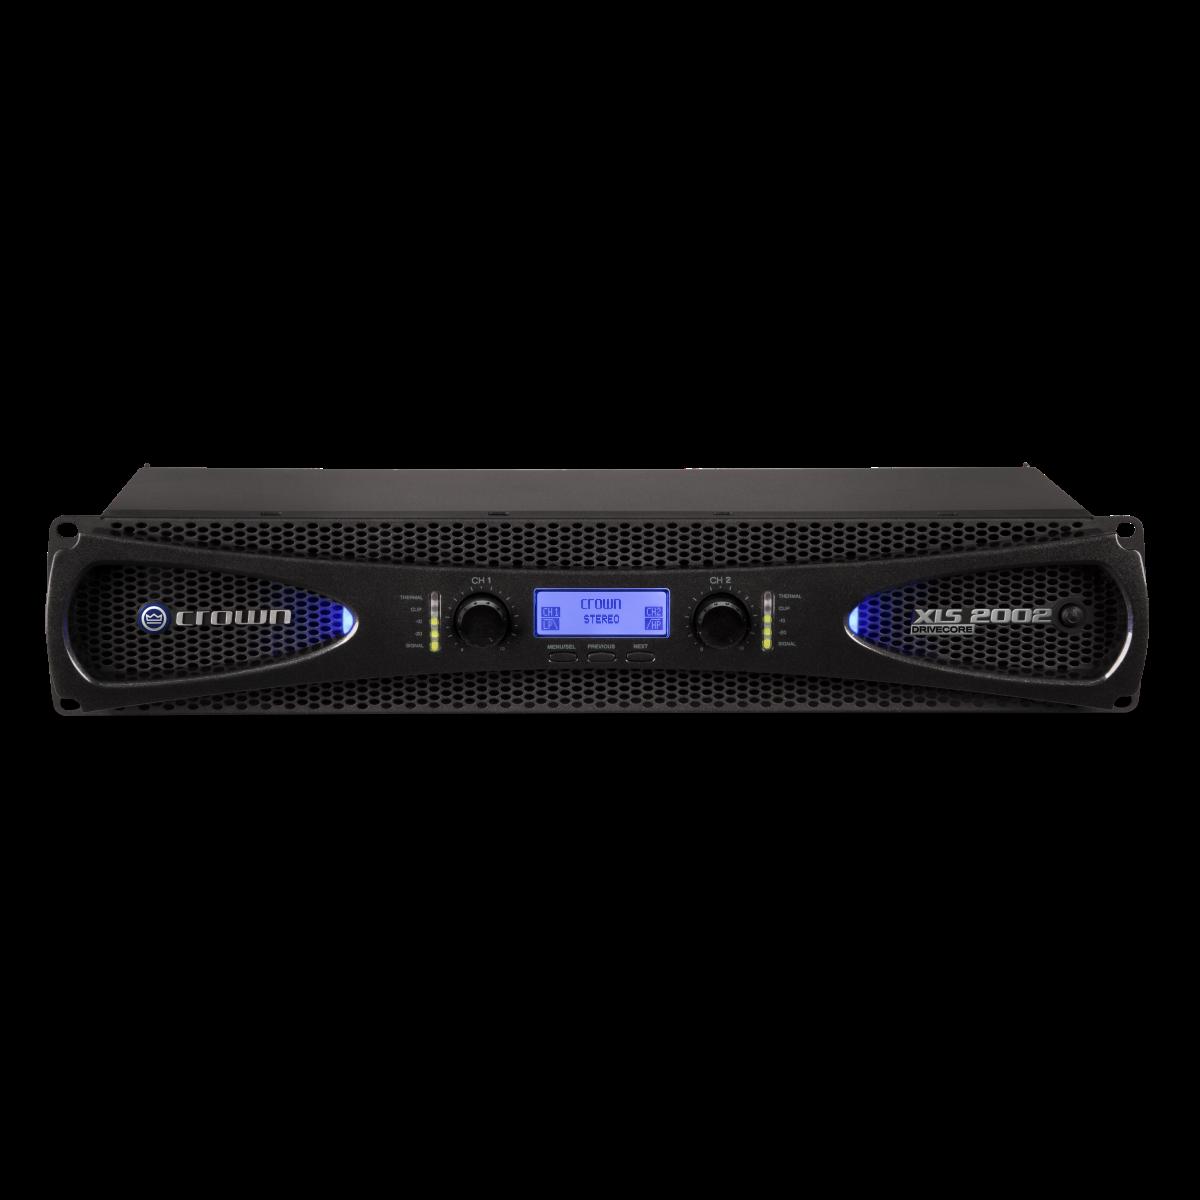 AMCRON パワーアンプ(XLS2002)